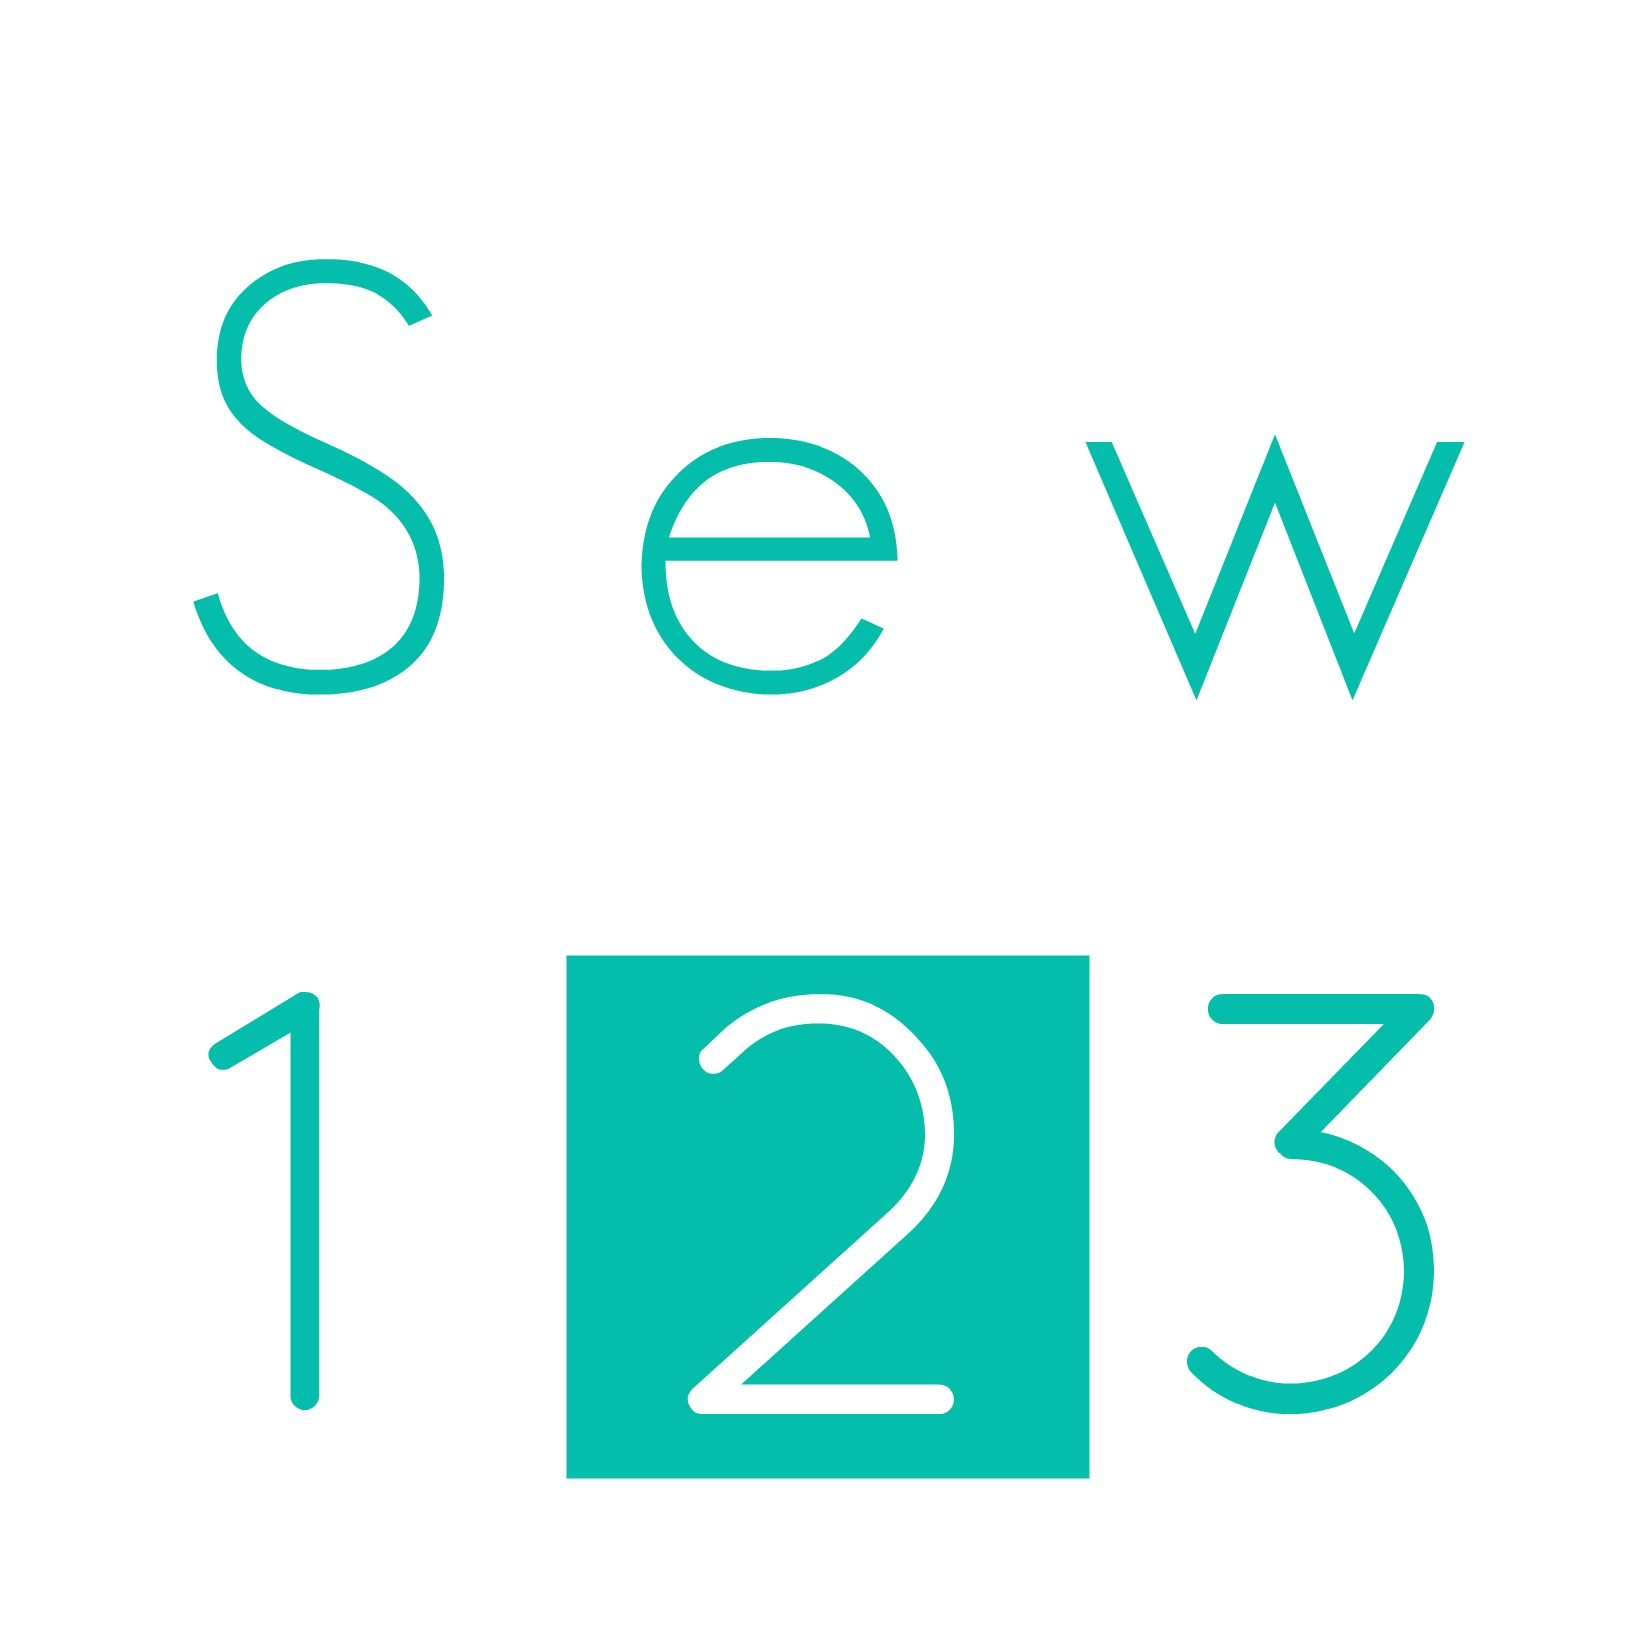 Sew 2 - Intermediate   Sew You Studio.com